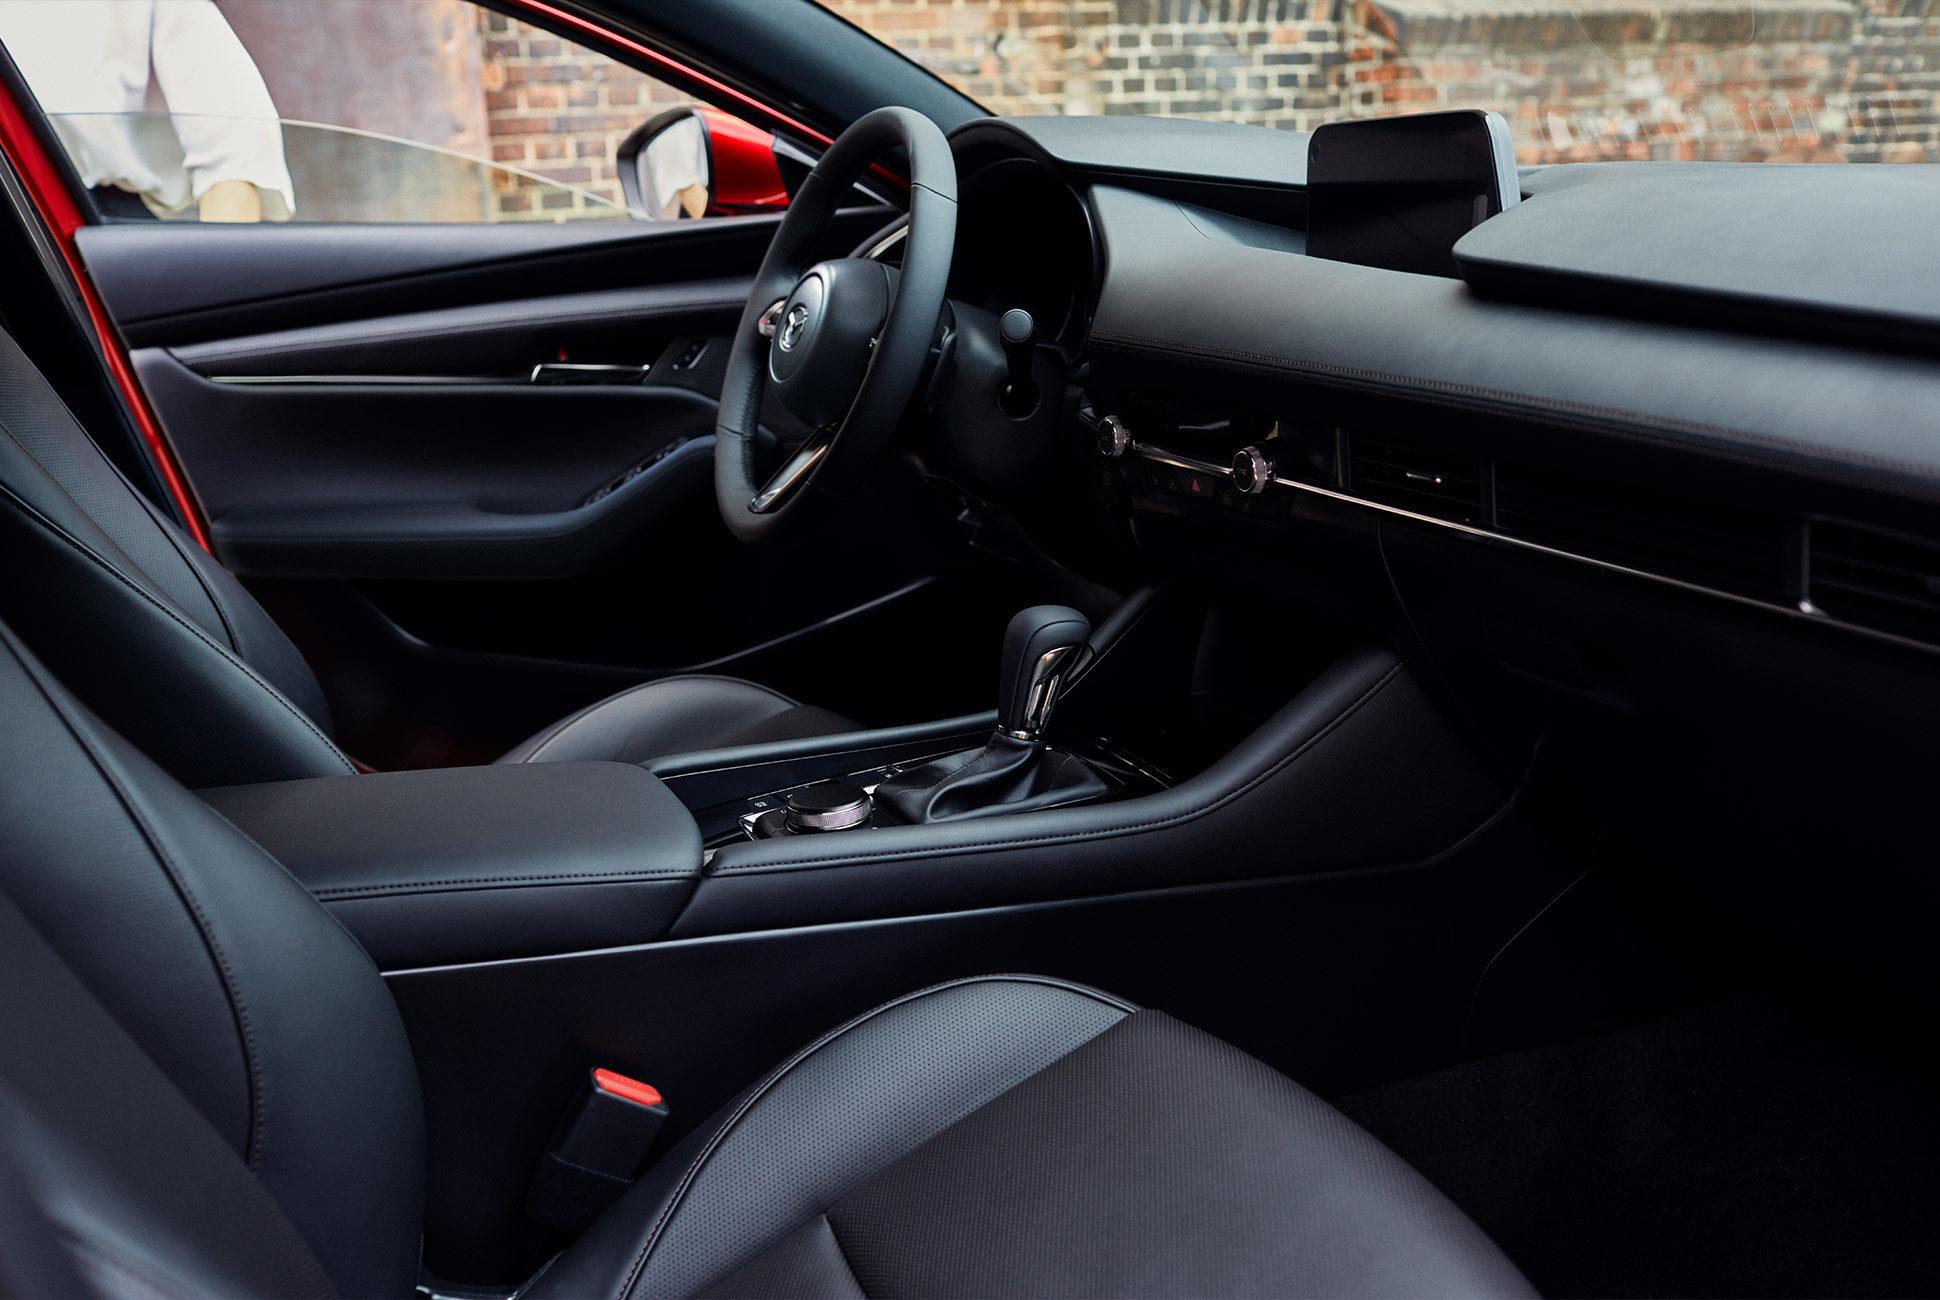 2018 - [Mazda] 3 IV - Page 11 Next-g11